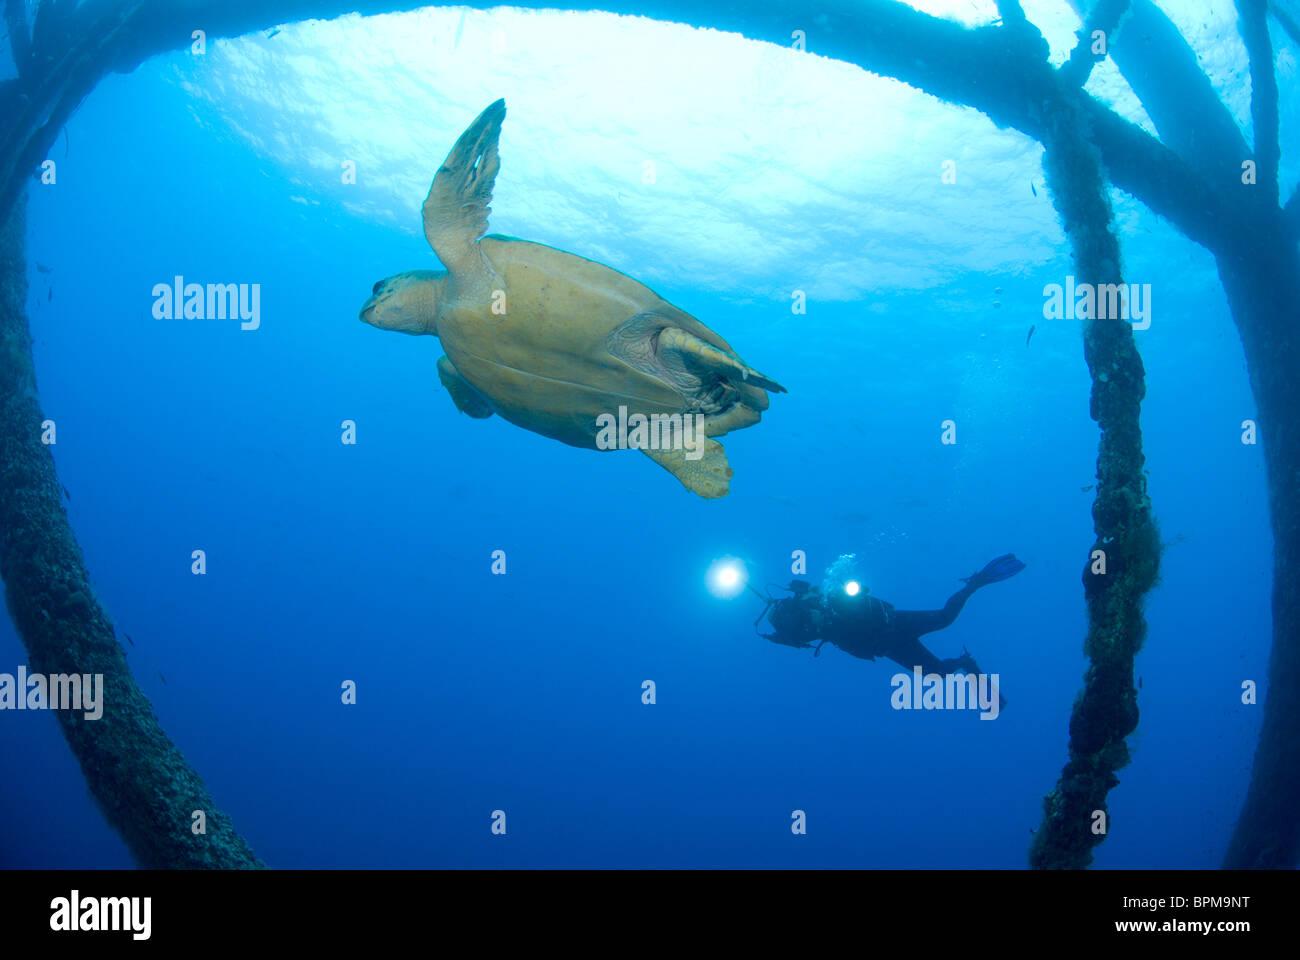 Loggerhead turtle, Caretta caretta, at HI-389 rig near East Flower Garden Bank, Gulf of Mexico Stock Photo